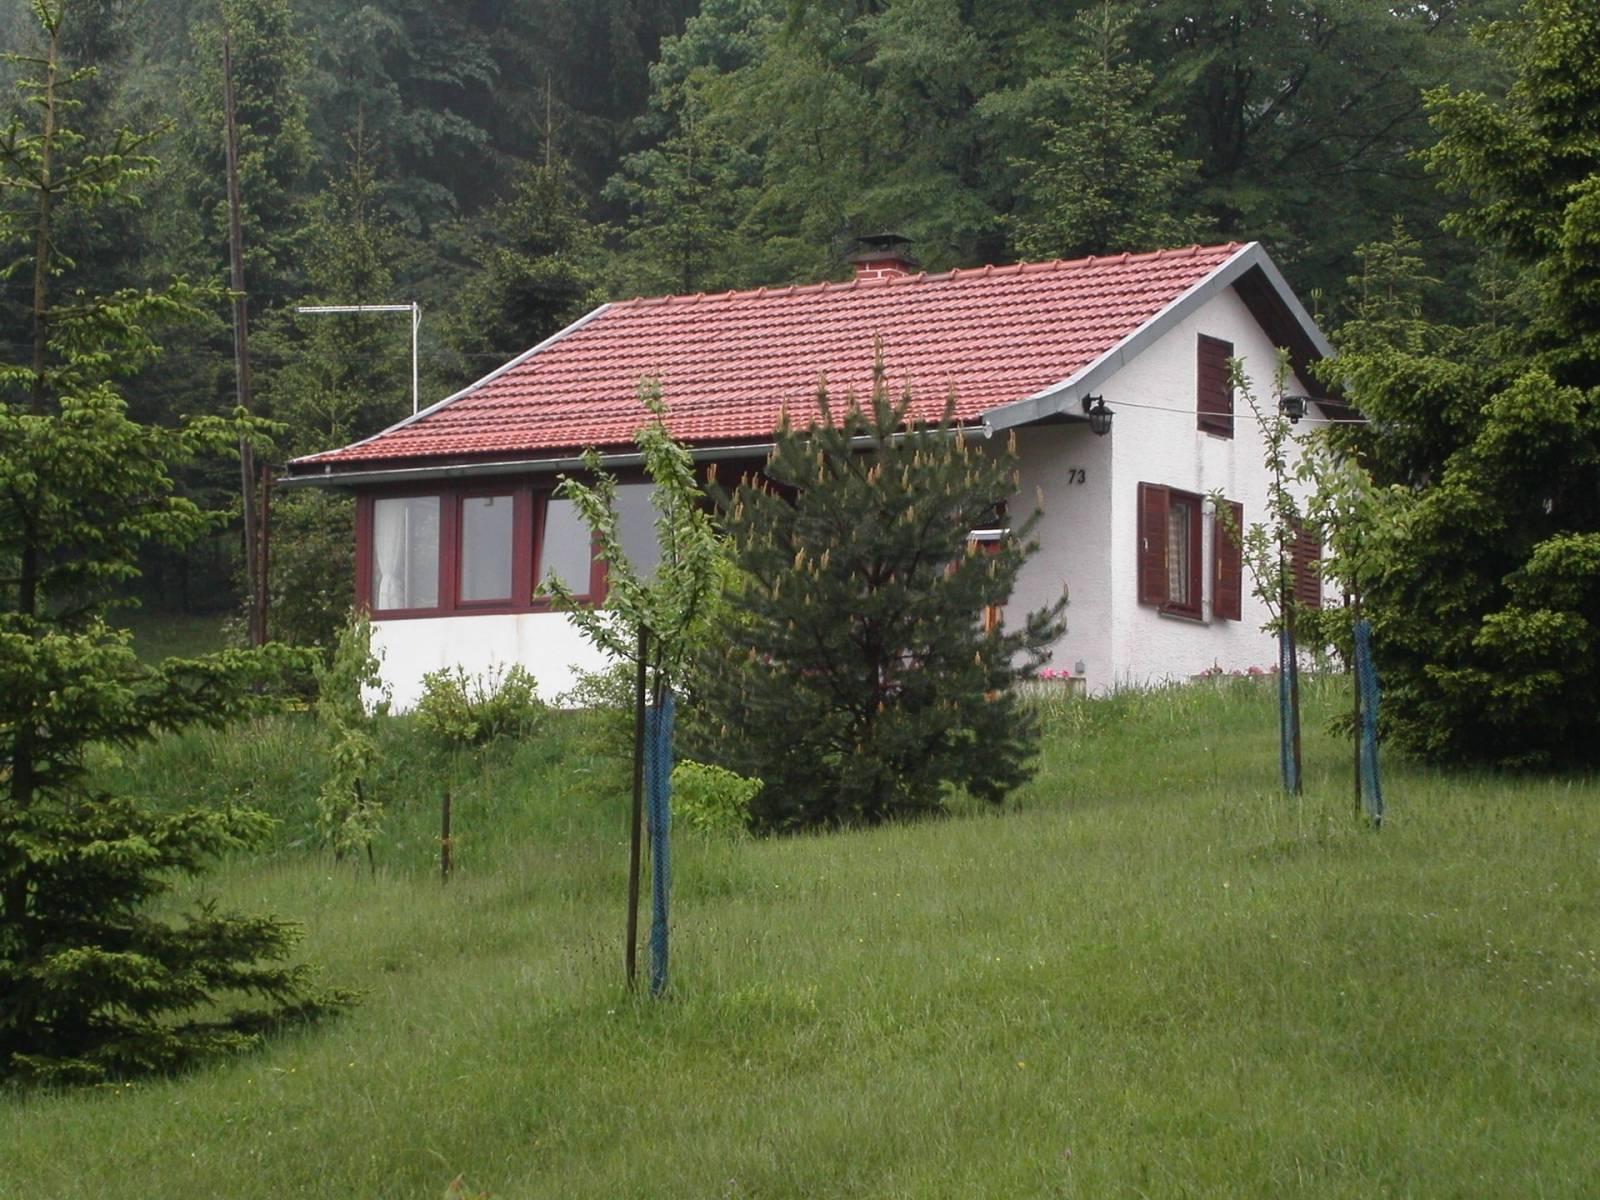 Gorski kotar vikend kuća, Jablan 37.19 m2